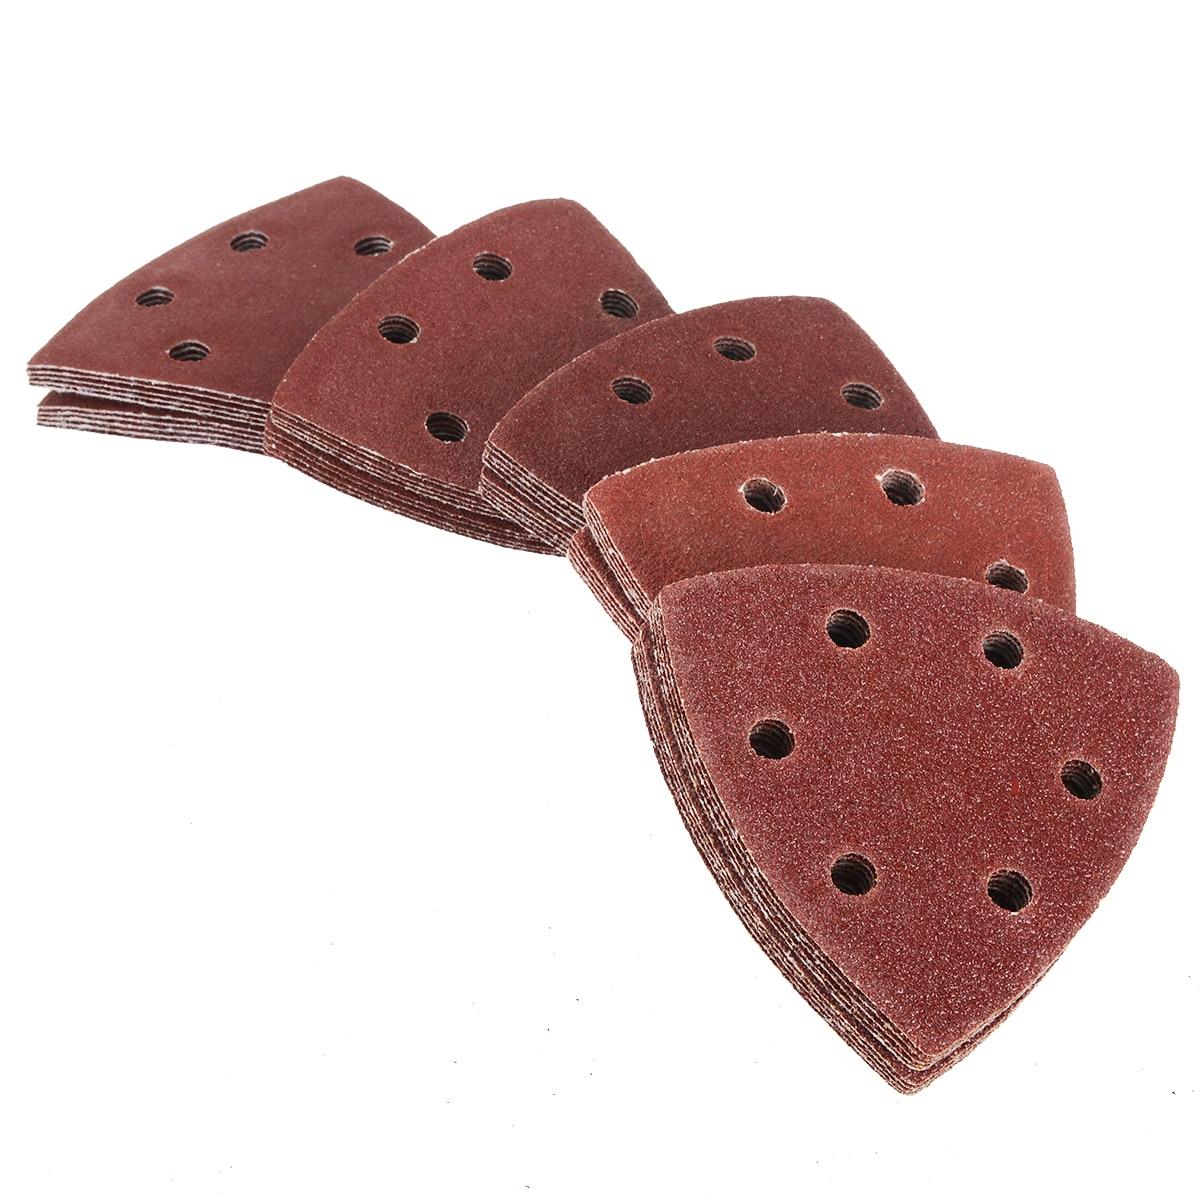 Mayitr 50Pcs 90mm Triangle Sanding Sheets Mouse Detail Sander Pads Sandpaper 40 60 80 100 120Grit For Grinding Abrasive Tools